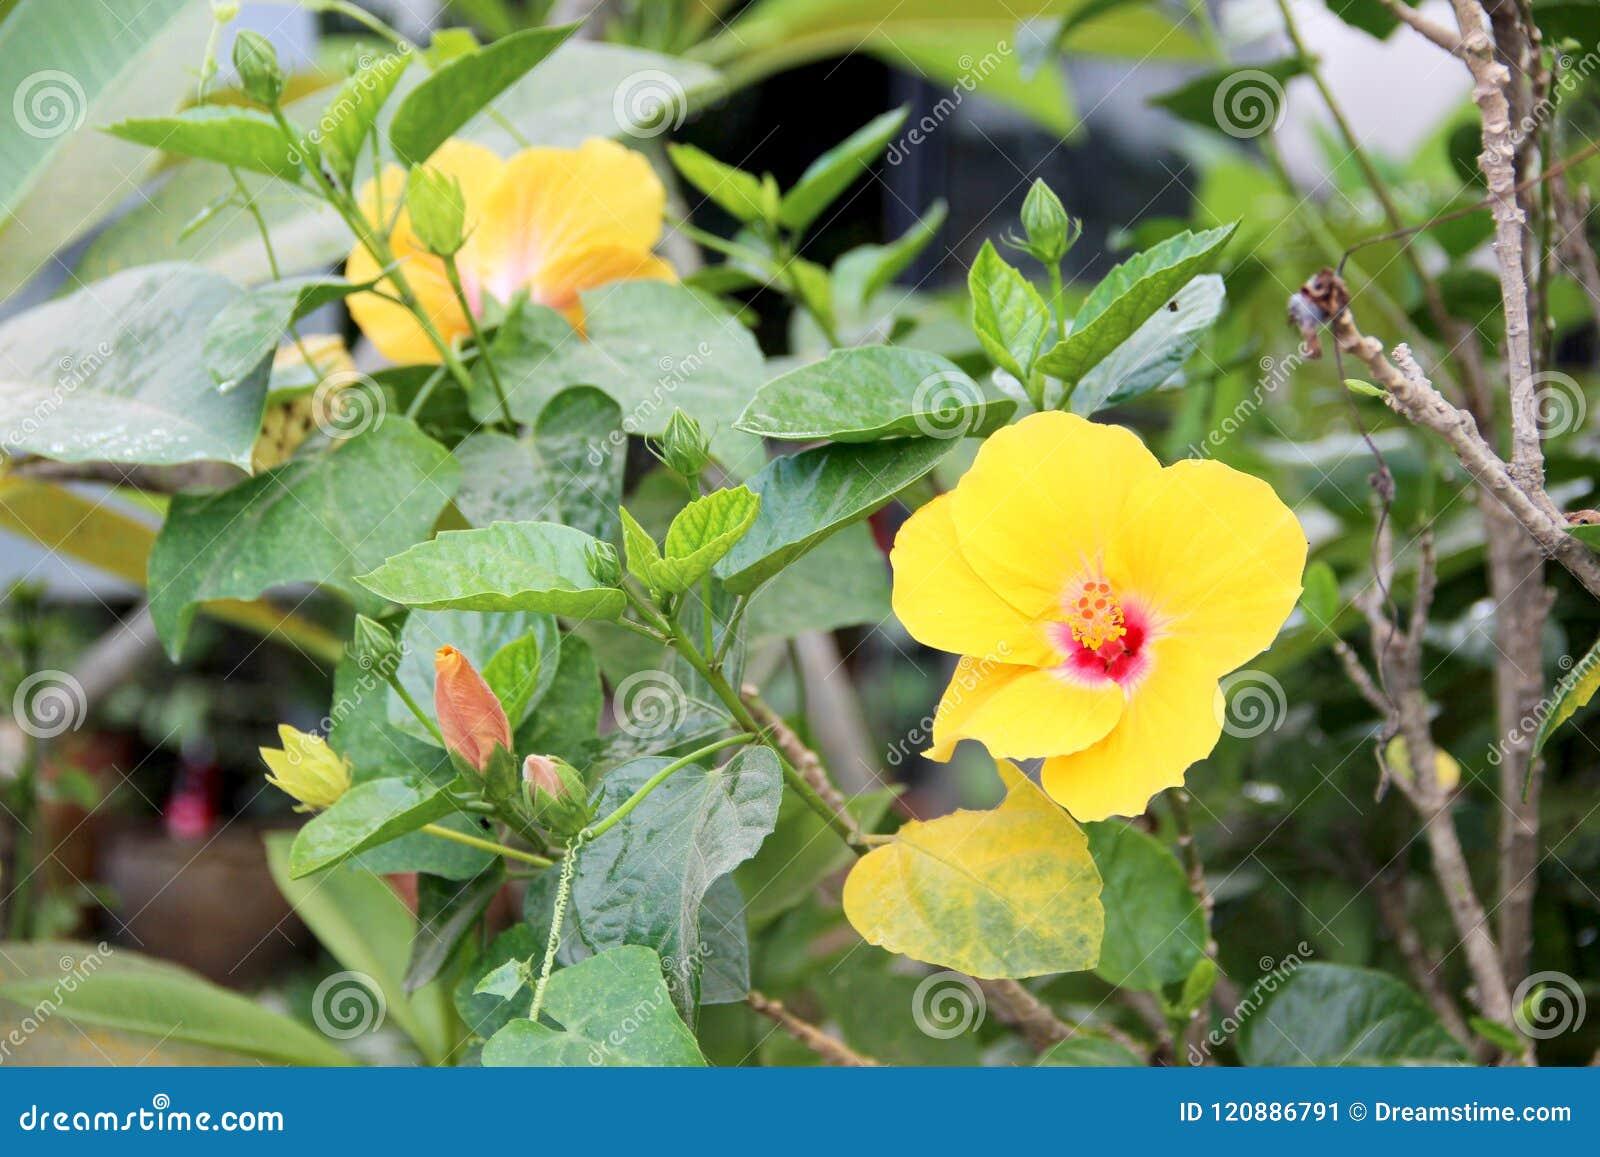 Hawaiian hibiscus stock image image of native species 120886791 hawaiian hibiscus izmirmasajfo